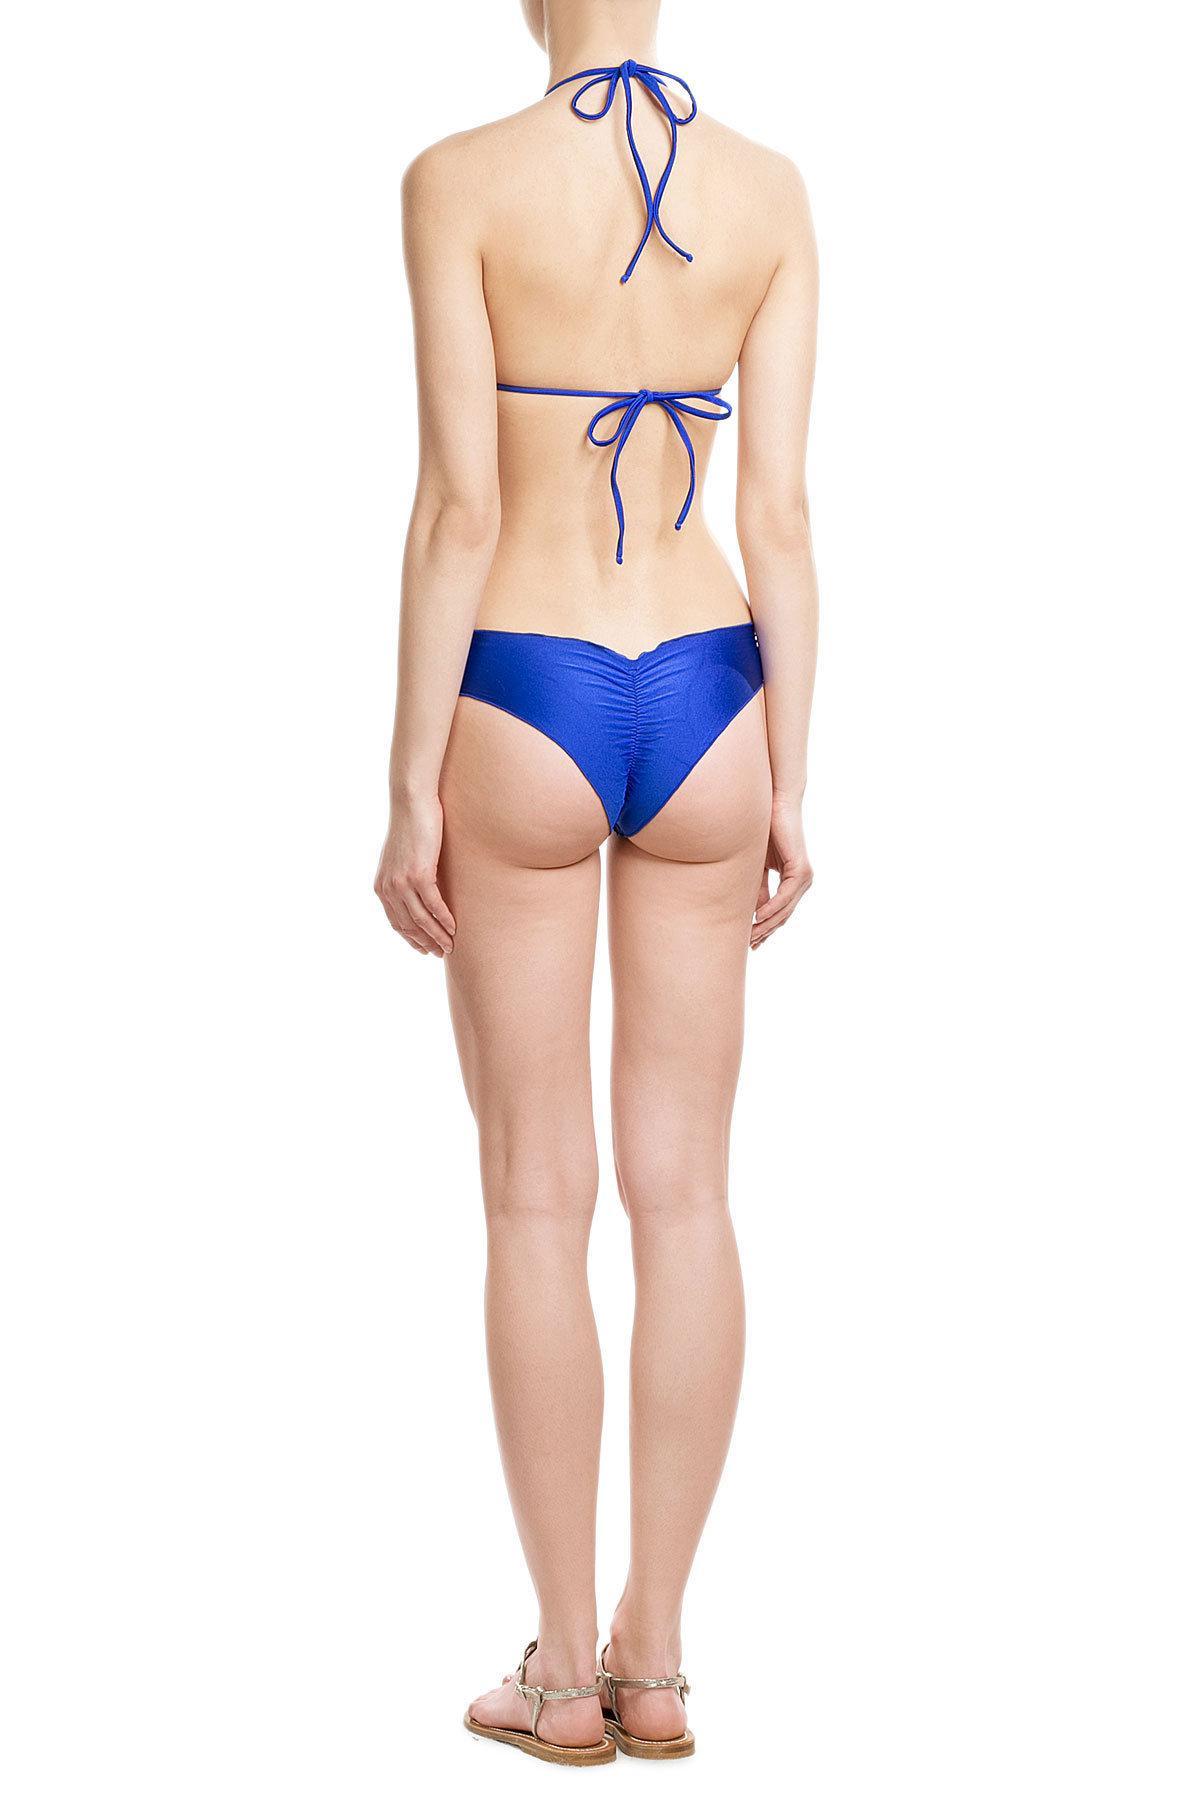 Luli fama Cosita Buena Wavey Bikini Bottoms in Black